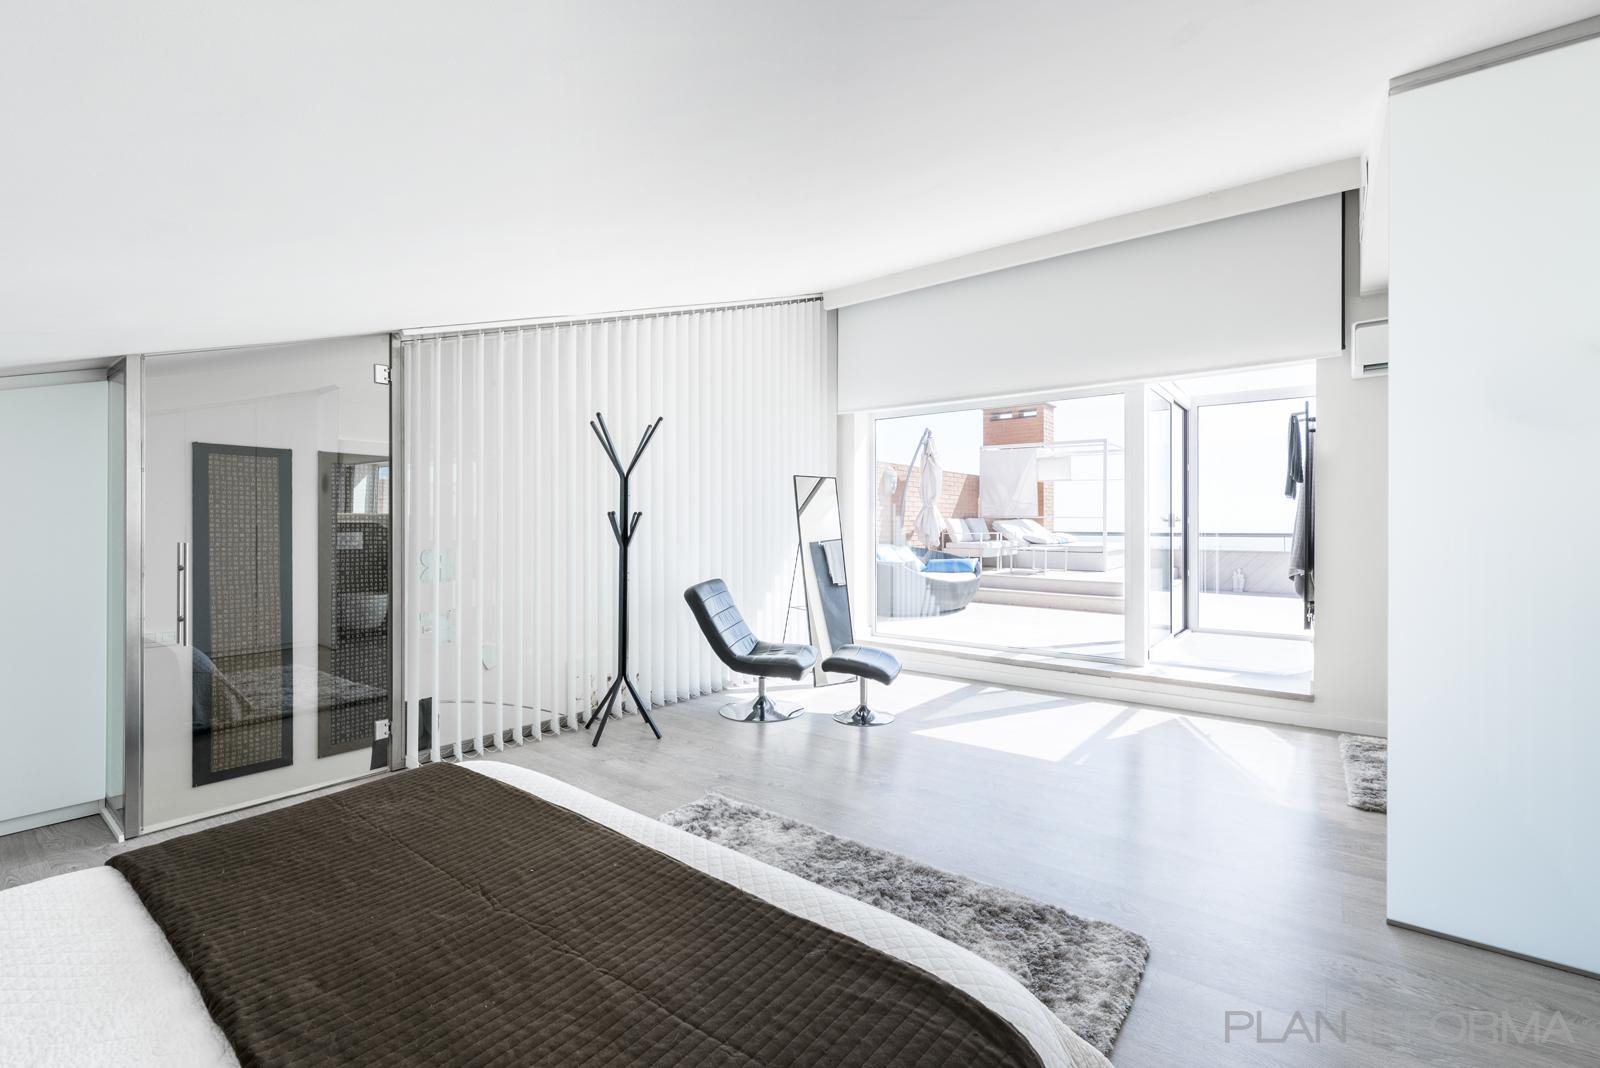 Dormitorio, Terraza, Balcon Estilo vanguardista Color beige, marron, gris  diseñado por Best Innova Project S.L. | Gremio | Copyright Best Innova Project S.L.